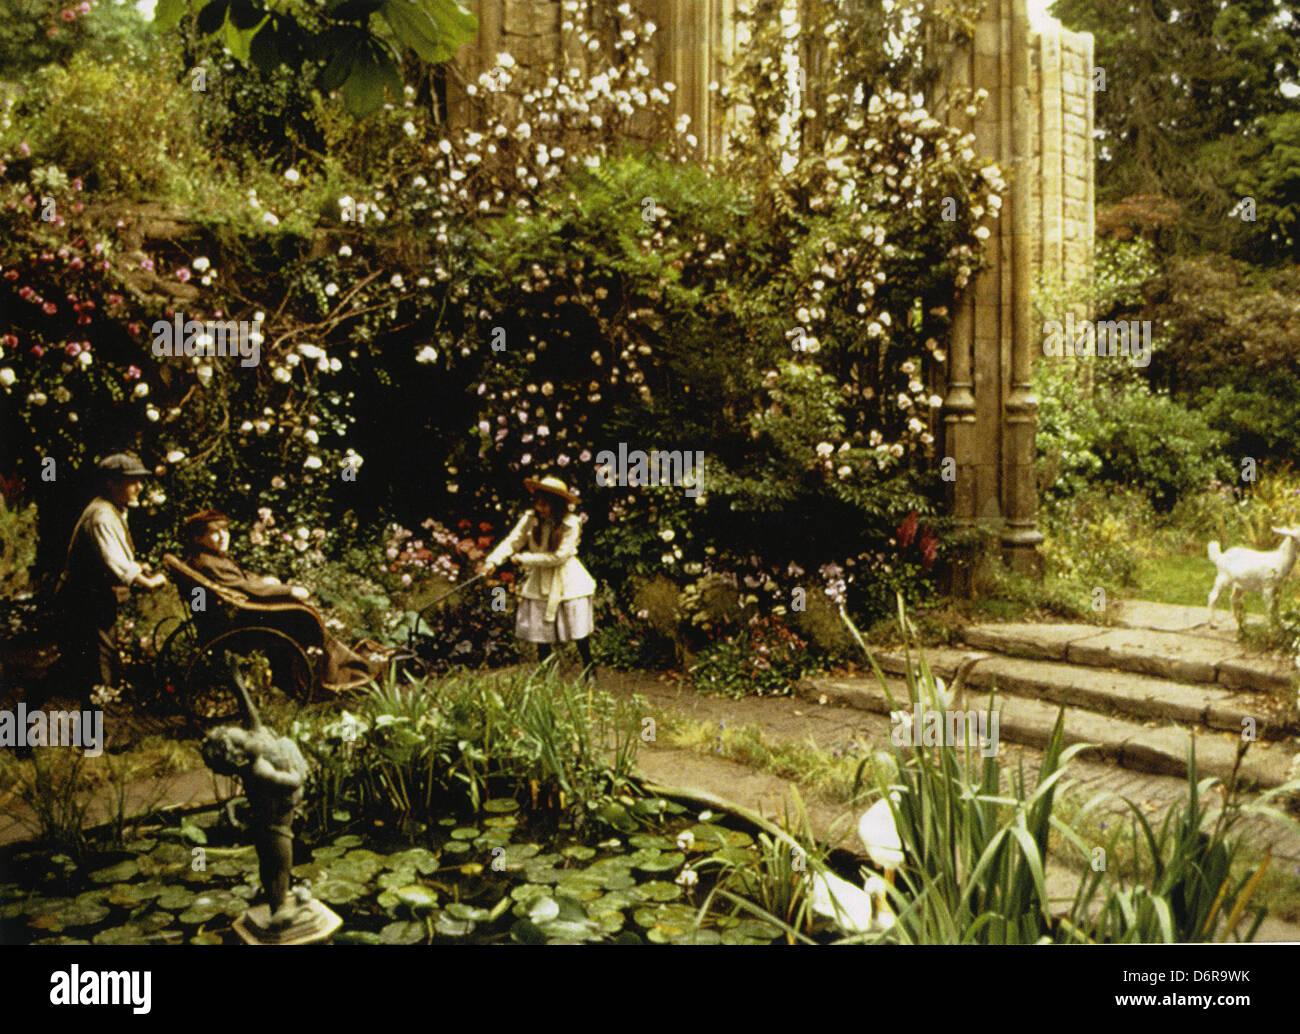 The Secret Garden Film Stock Photos & The Secret Garden Film Stock ...